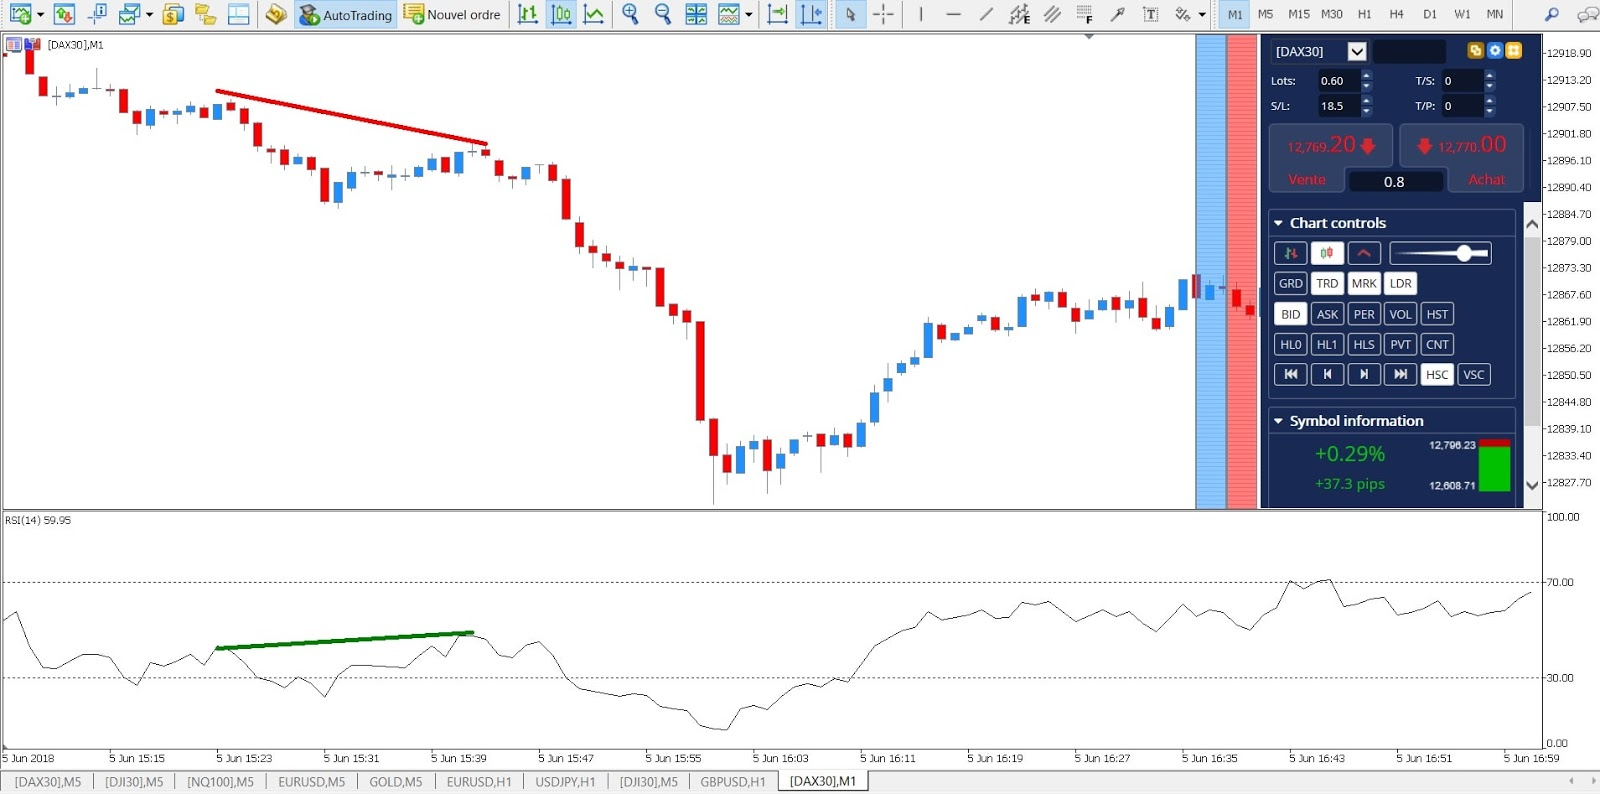 divergenza rsi indicatore trading